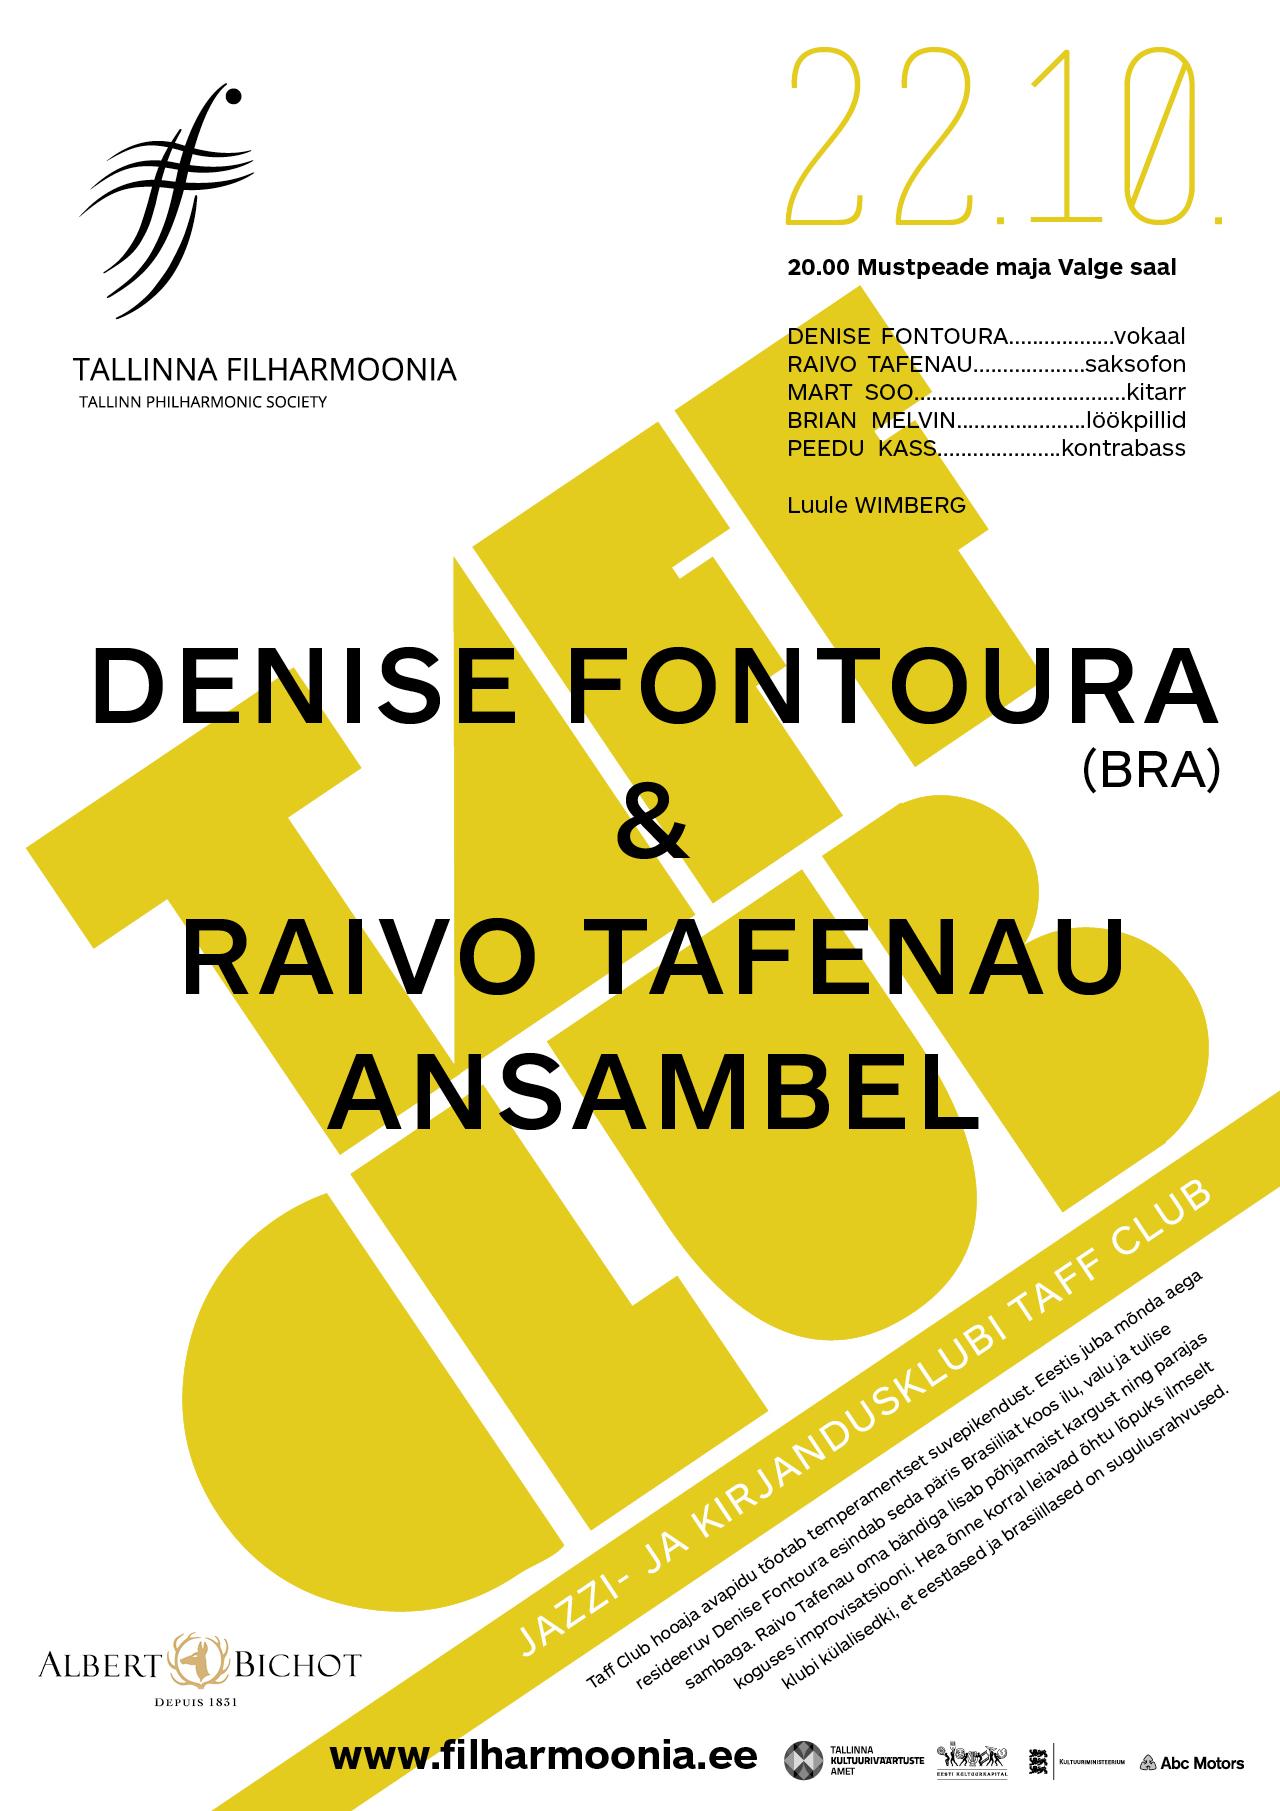 TAFF CLUB. DENISE FONTOURA & RAIVO TAFENAU ANSAMBEL